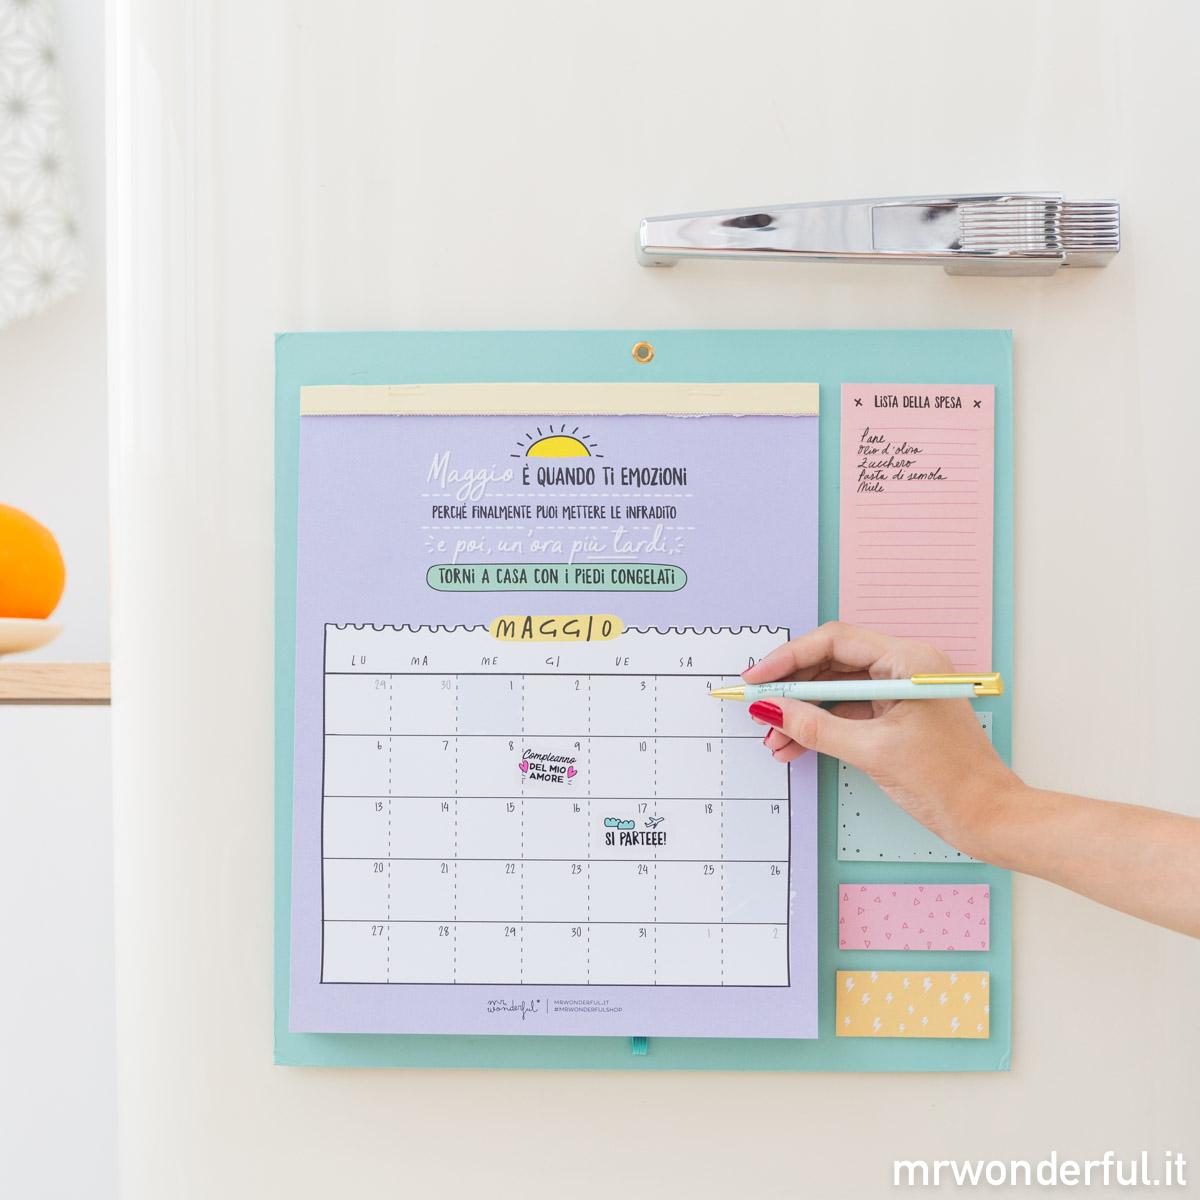 Calendario Mr Wonderful 2019.Calendario Da Muro Classico Mr Wonderful Cancelleria E